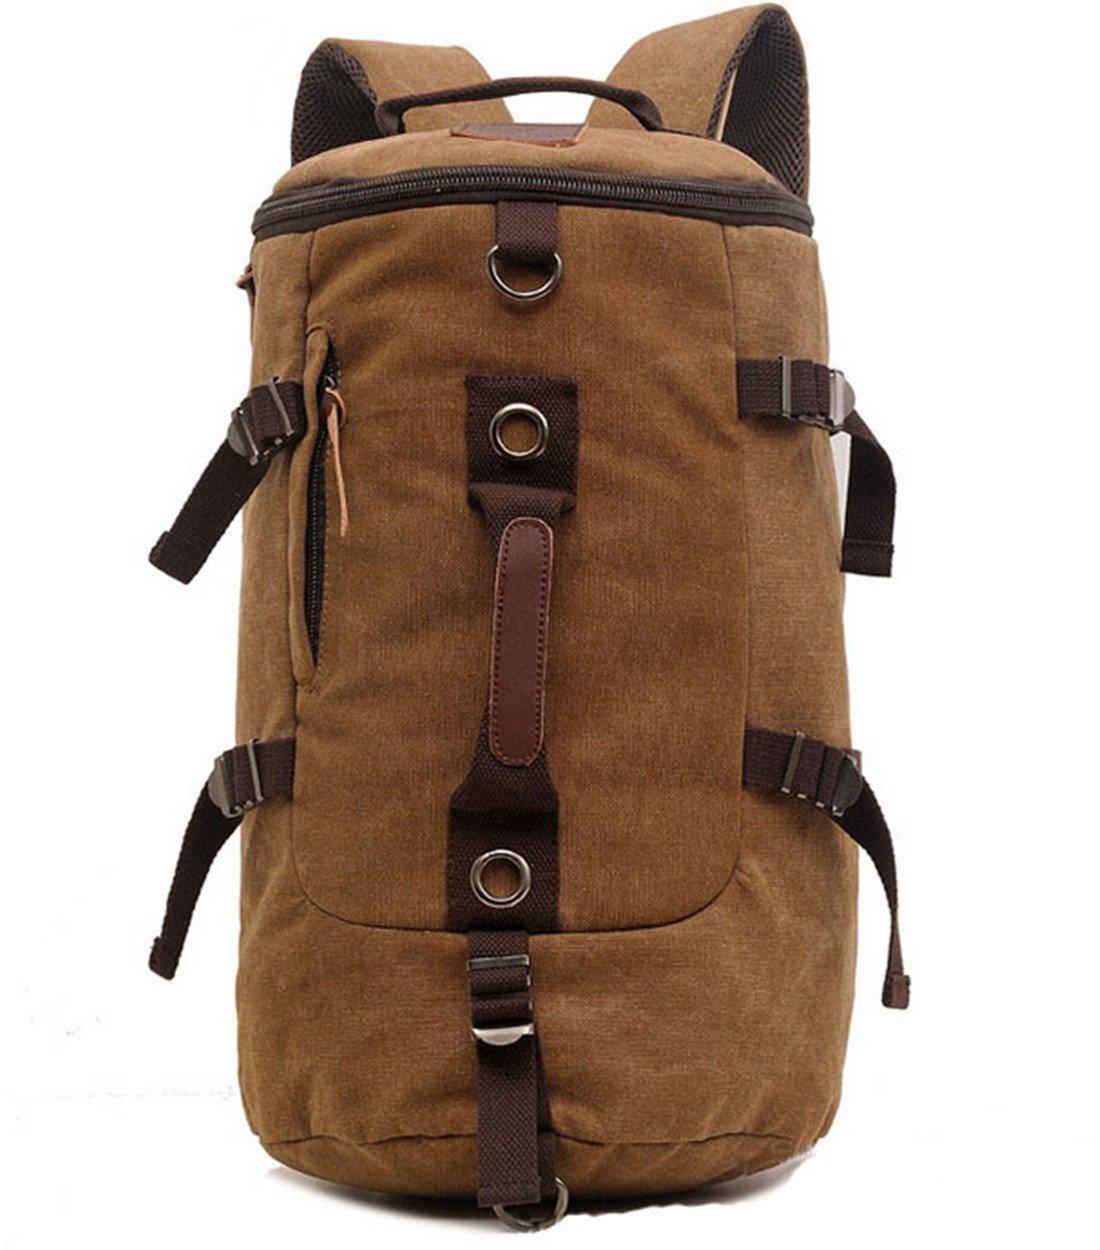 Large Capacity Men s Travel Bag   Mountain Backpack   Hiking Camping  Backpack   Gym Bag   Laptop backpack   Shoulder Bag   Retro Canvas Weekend  Travel ... c5f48dfde016a